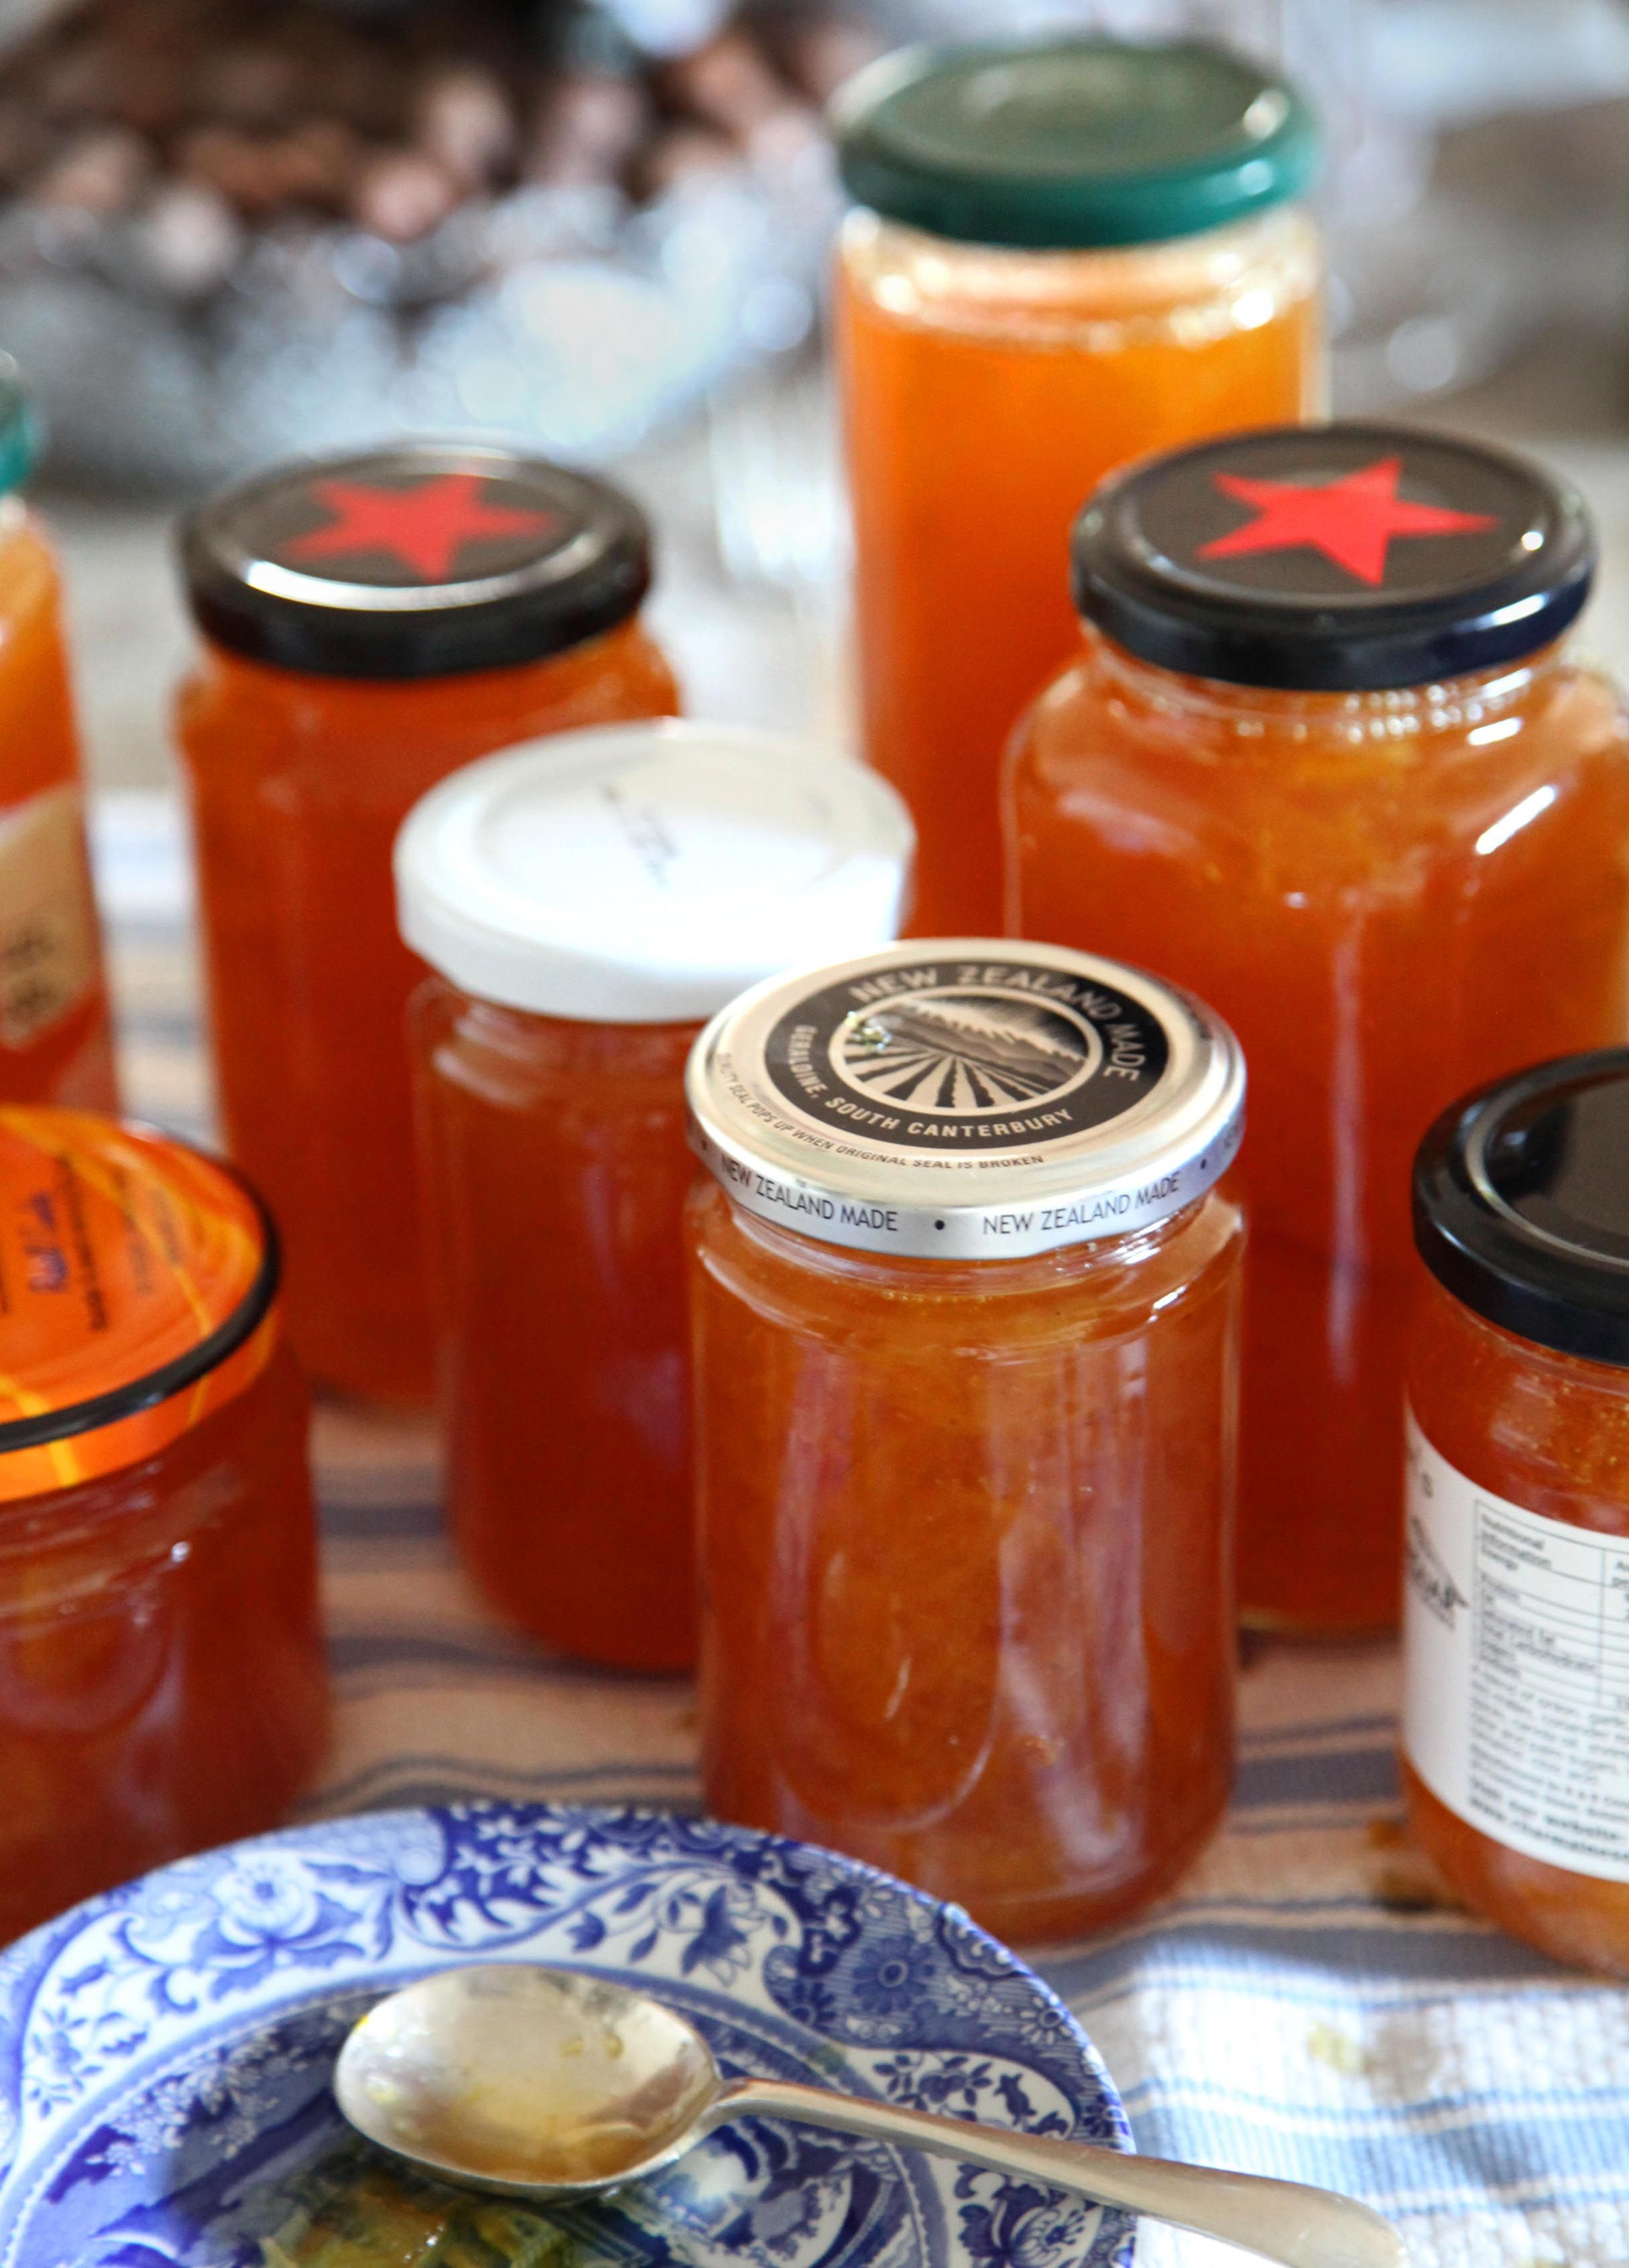 Making Grapefruit Marmalade  www.annabel-langbein.com